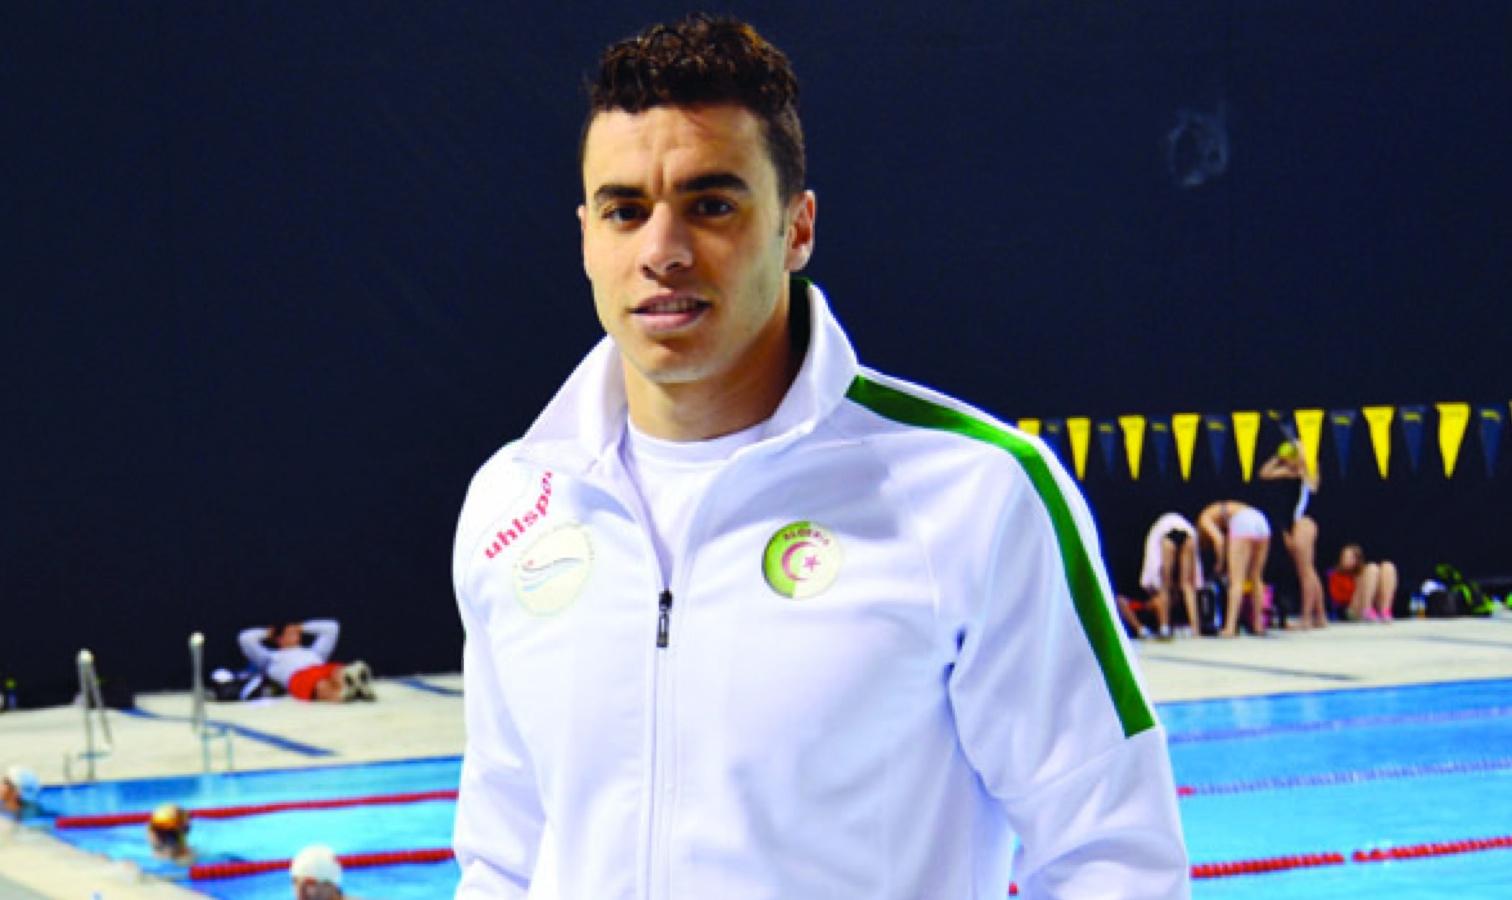 oussama sahnoune natation